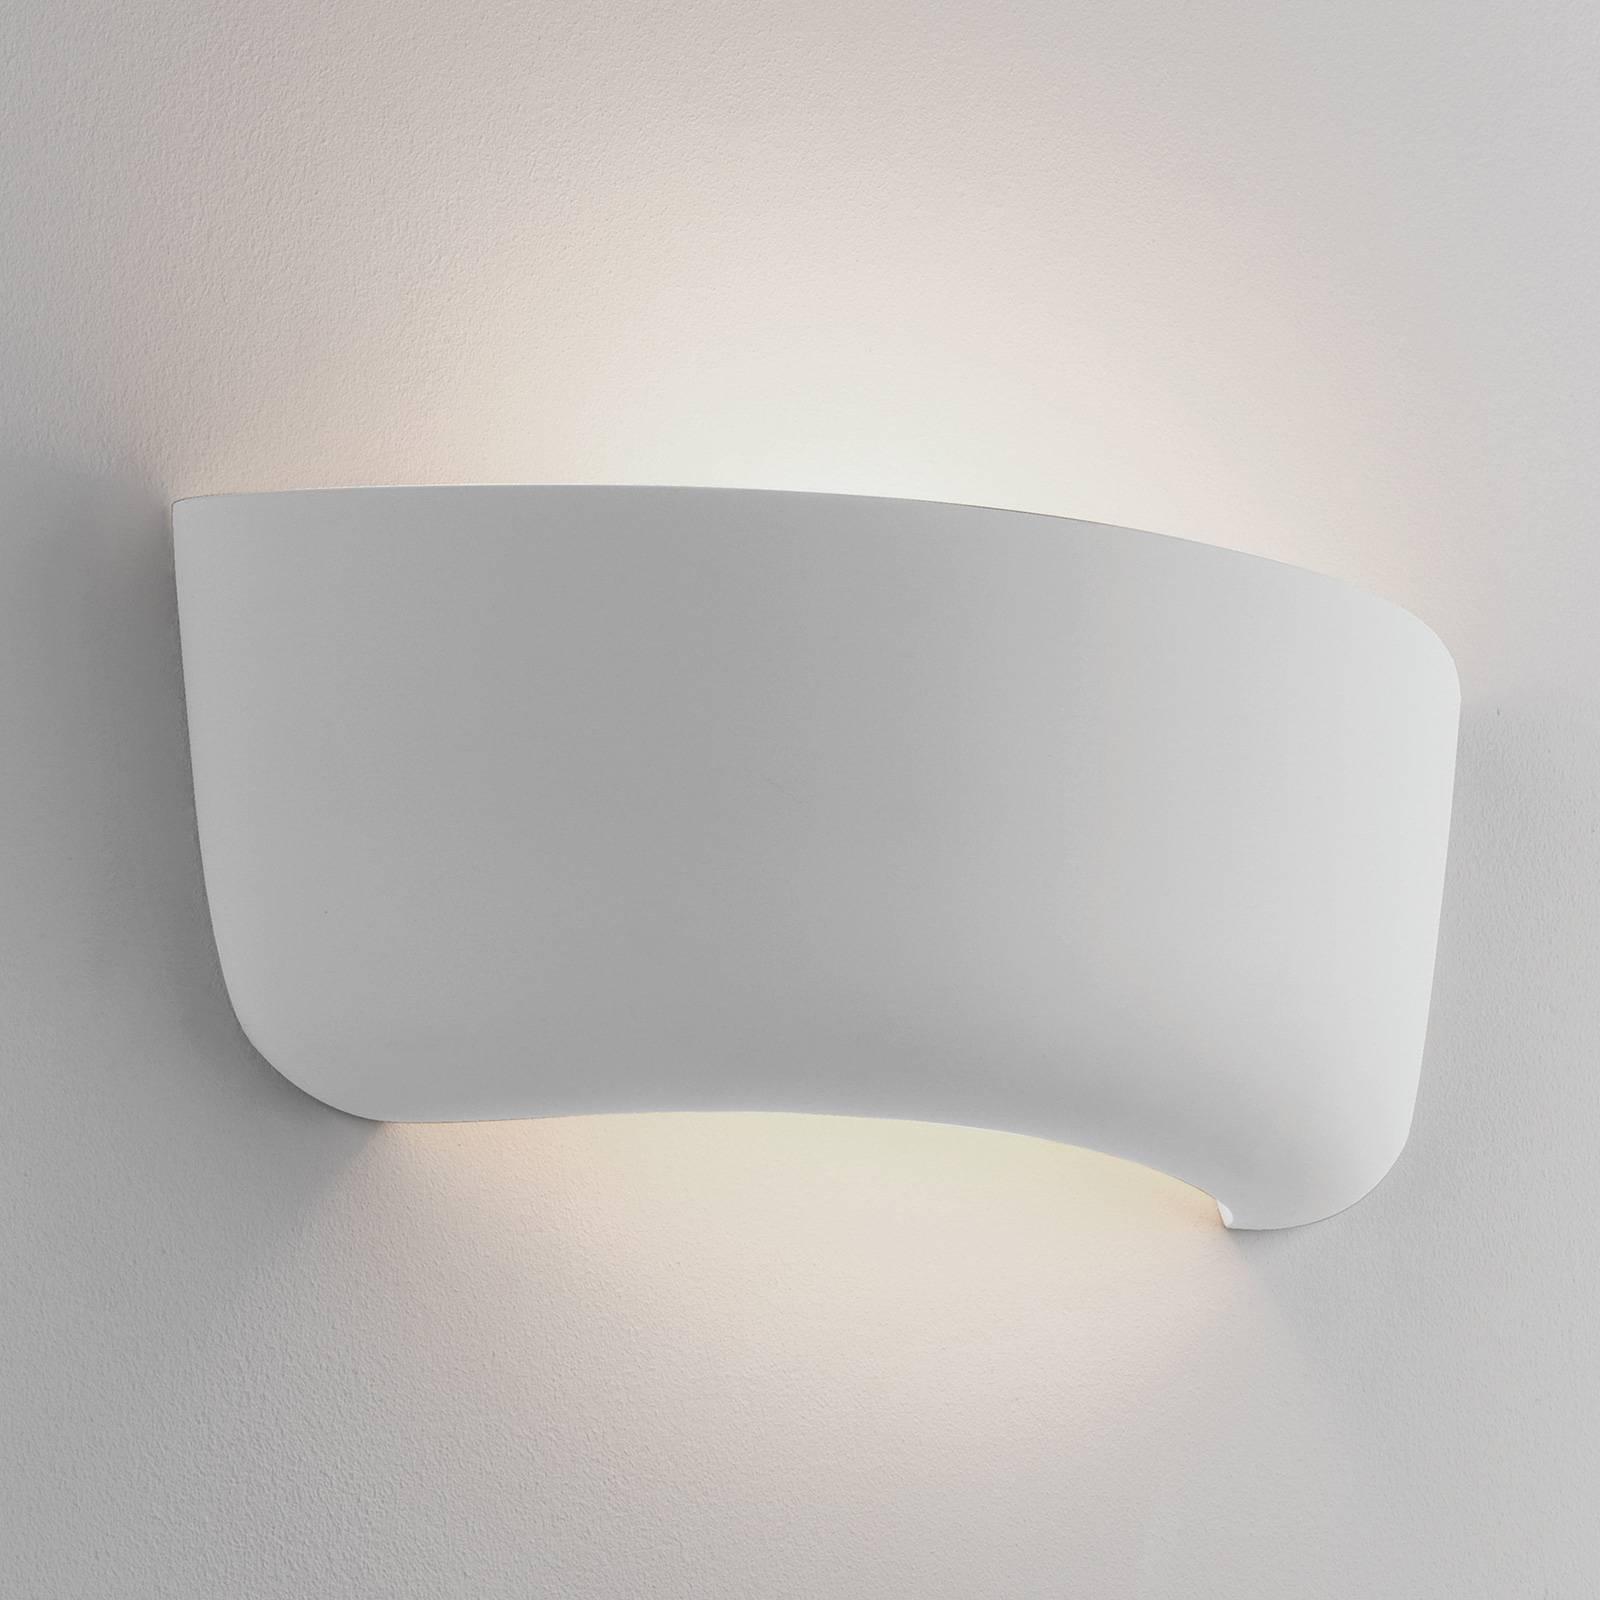 Astro Gosford 340 wandlamp van keramiek, 34 cm